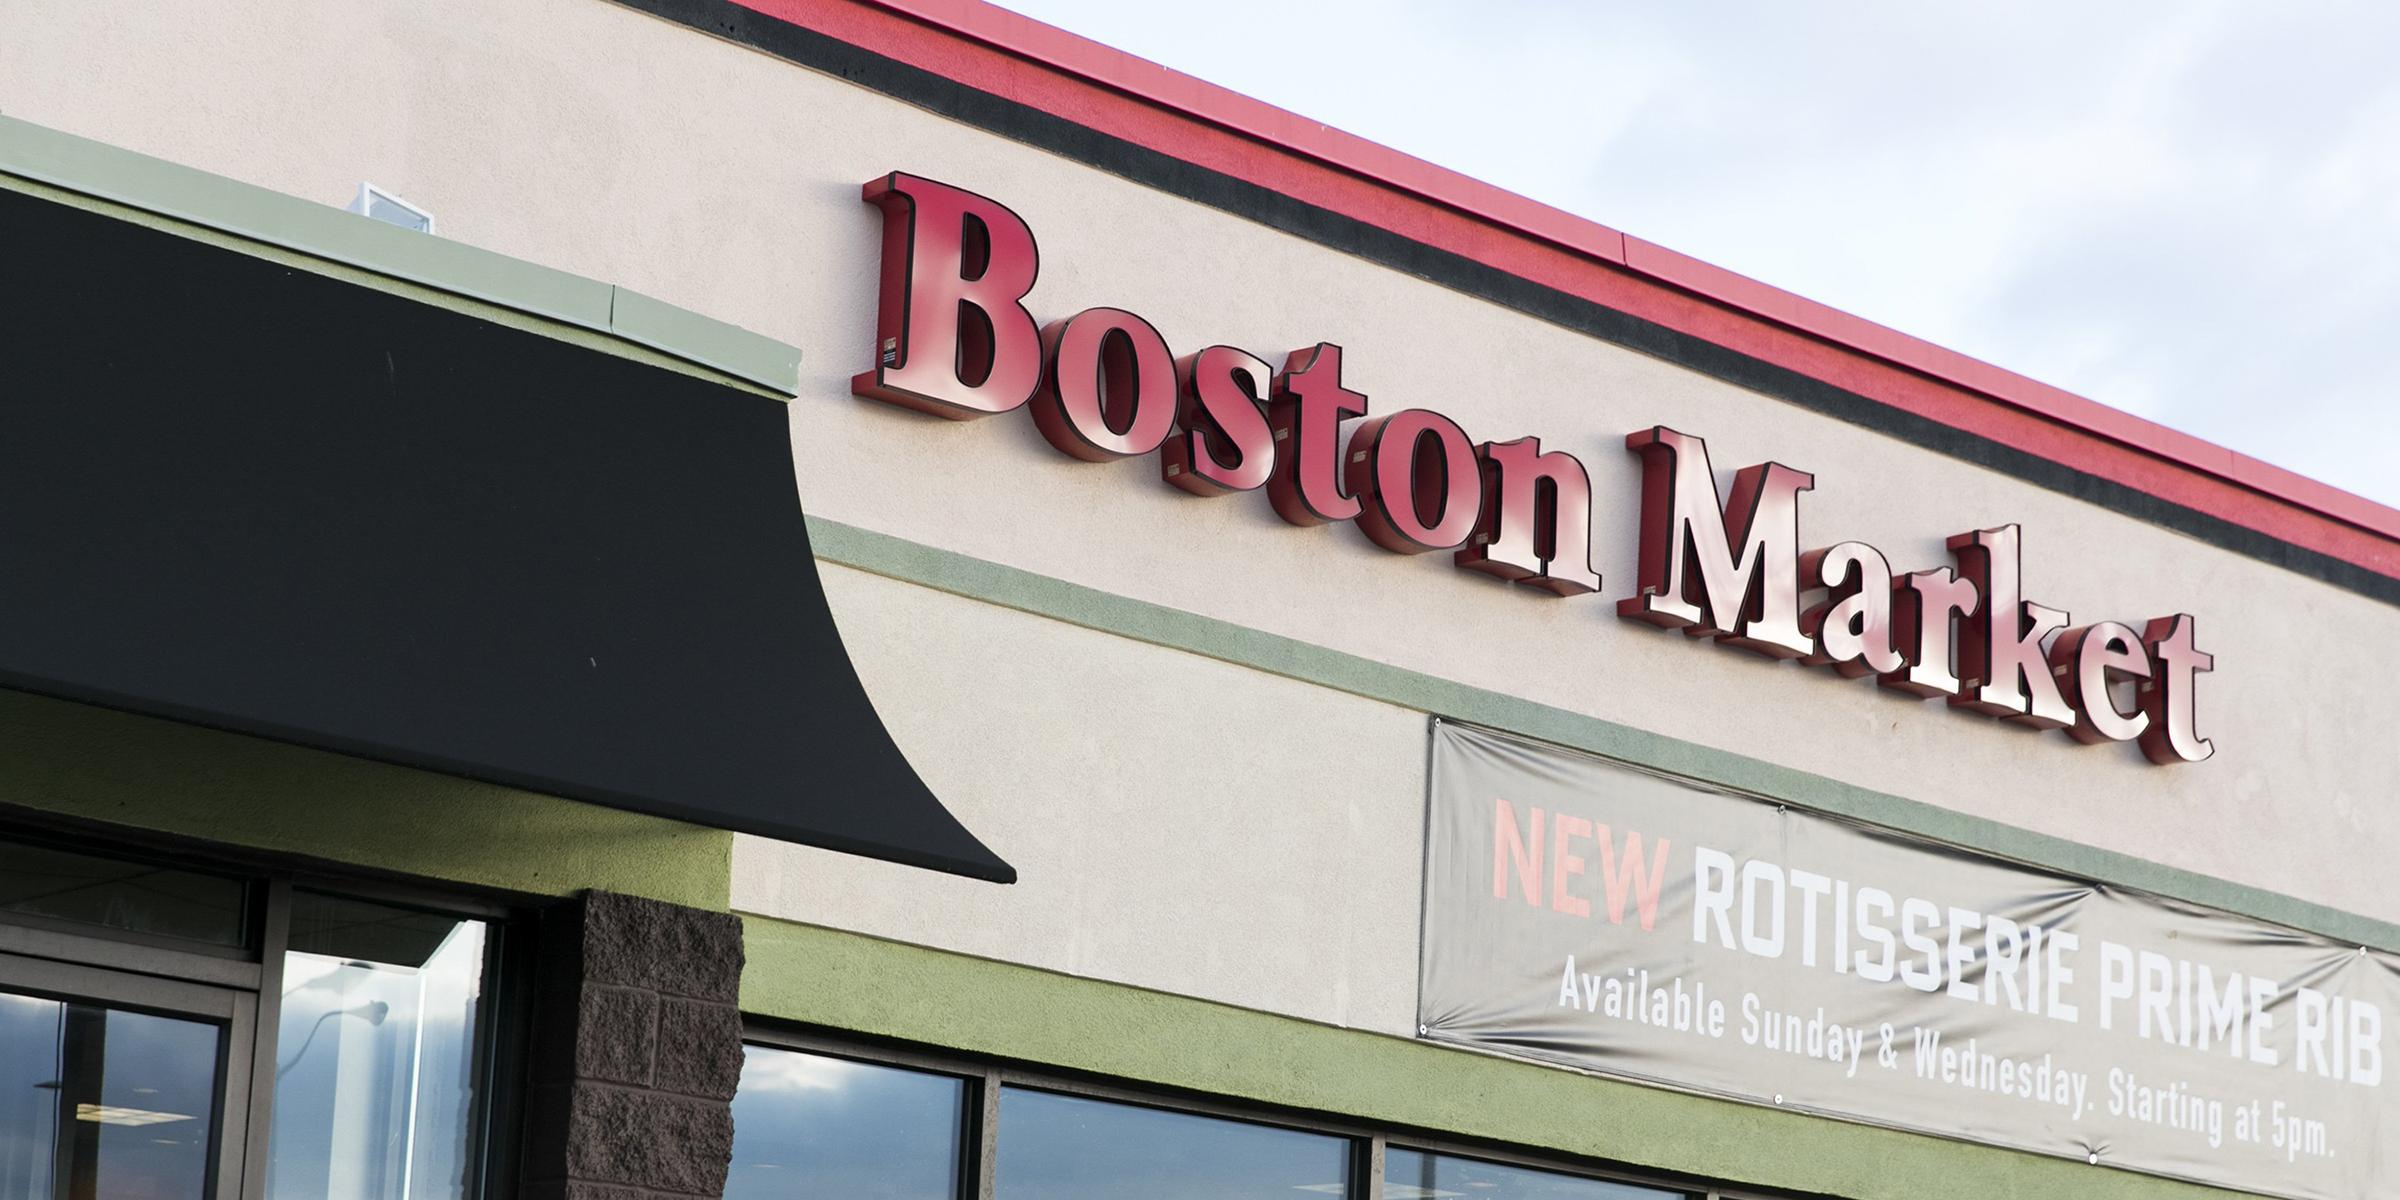 Boston Market just closed dozens of restaurants across the